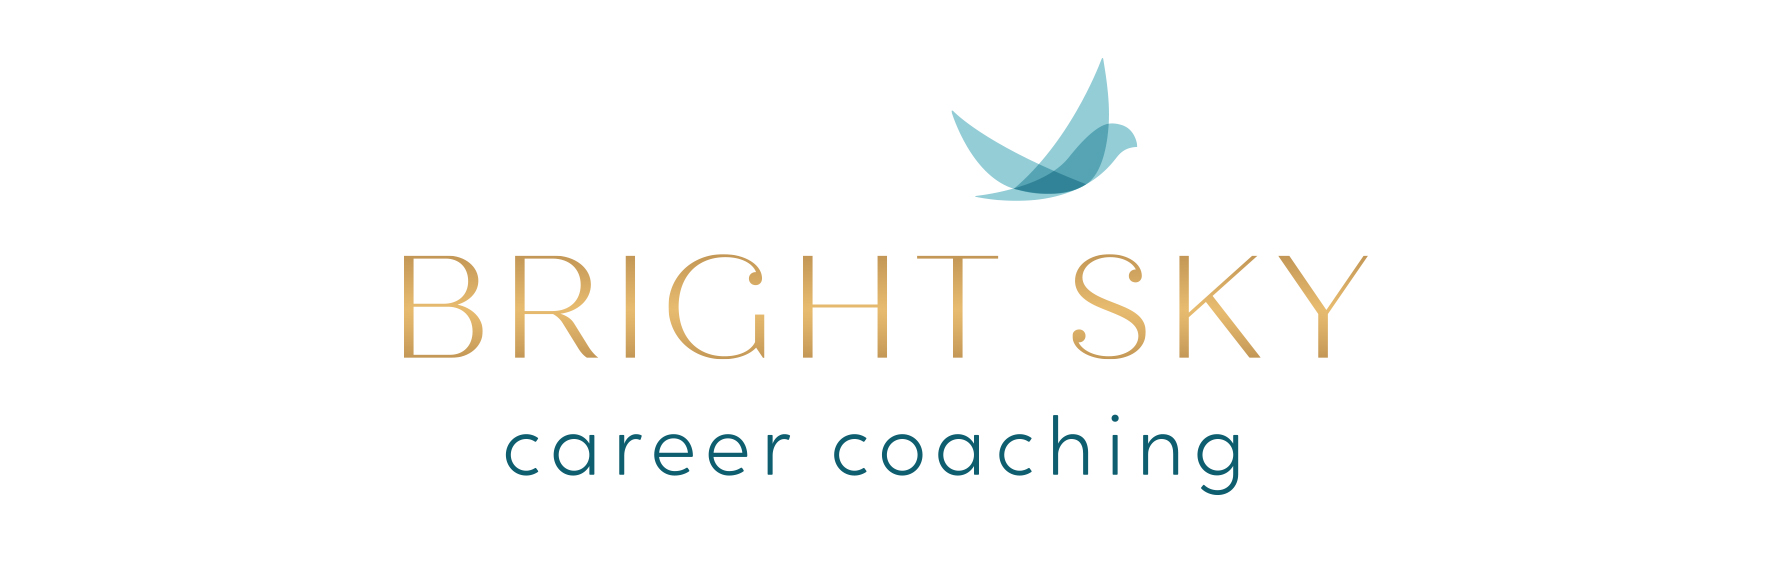 bright-sky-logo.jpg